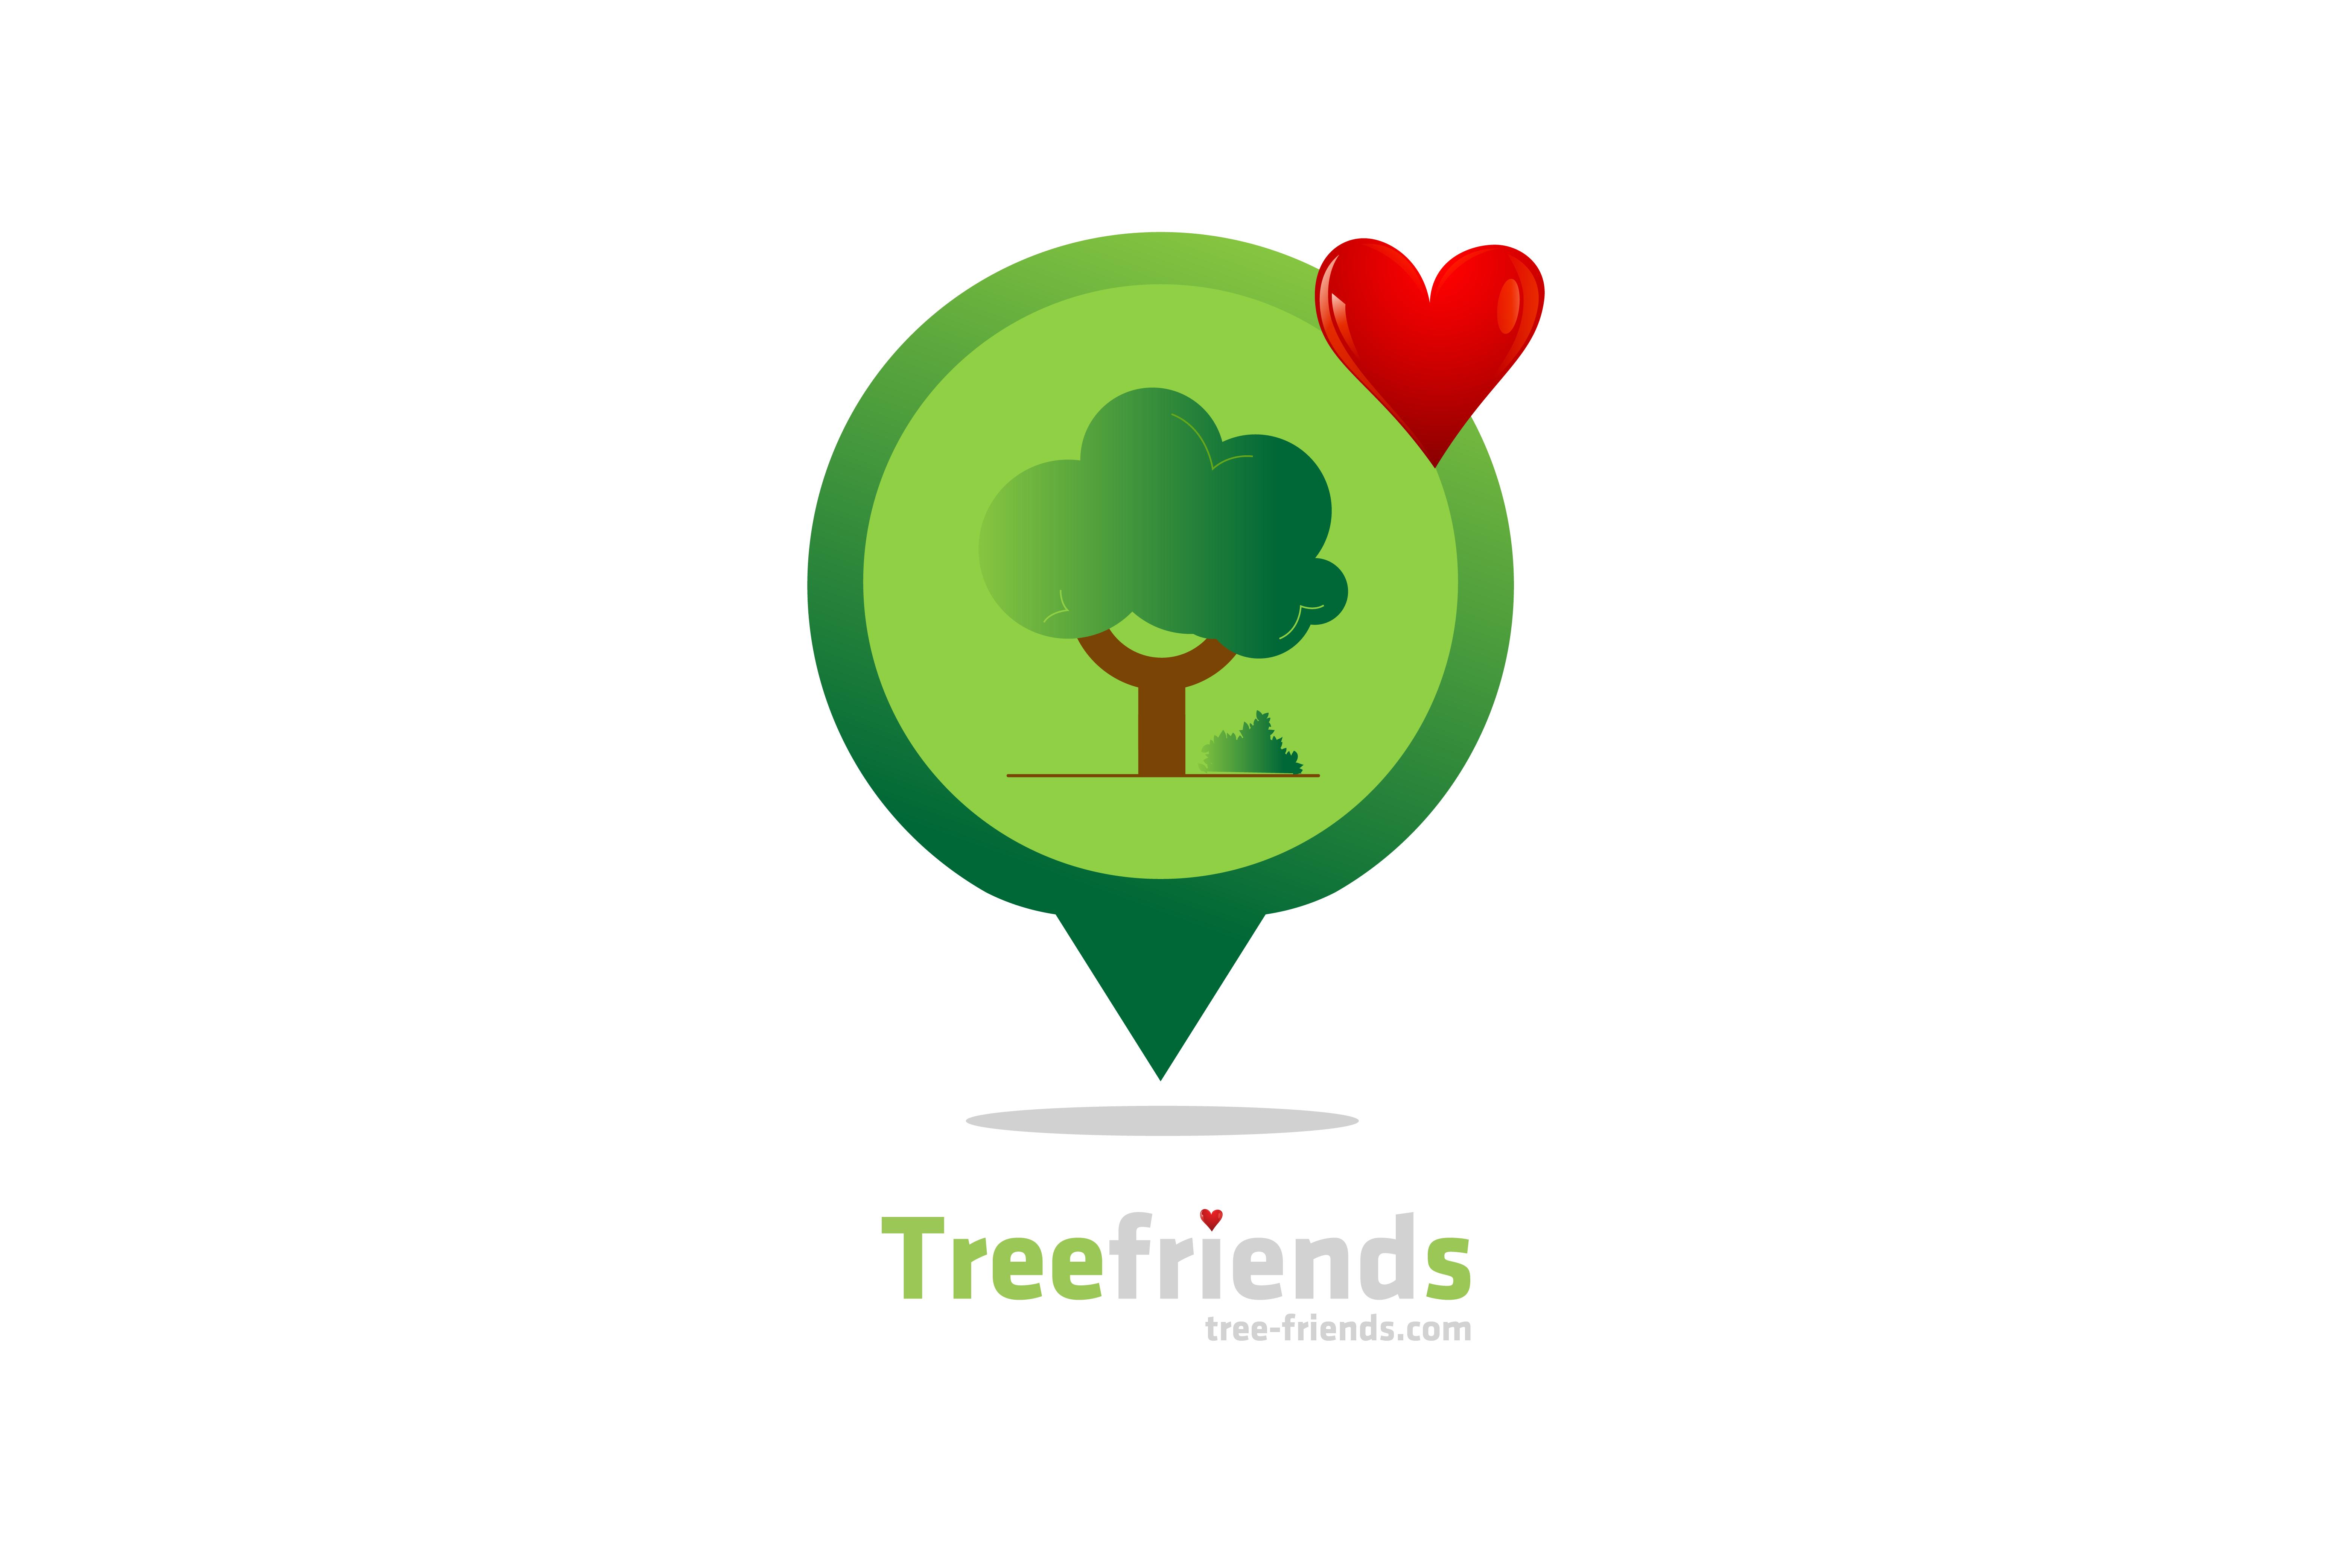 tree-friends.com